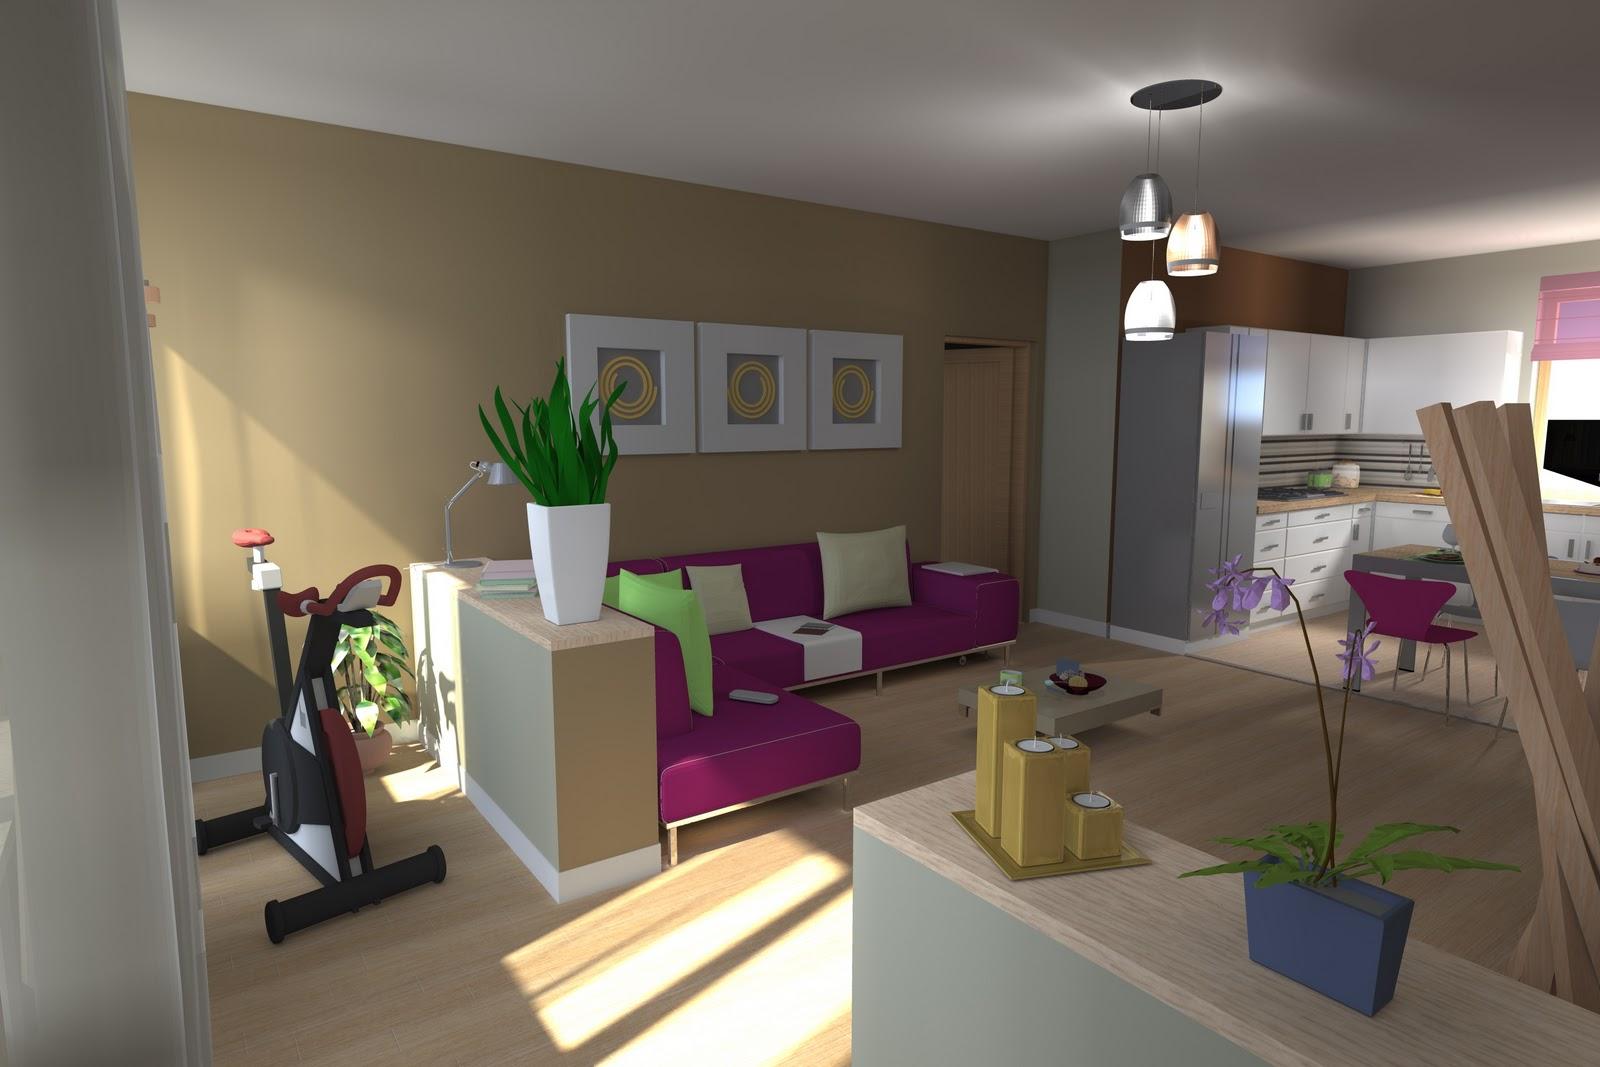 i. d. & a. 3 interior designers & architects: unico ambiente ... - Unico Ambiente Cucina Salone 2